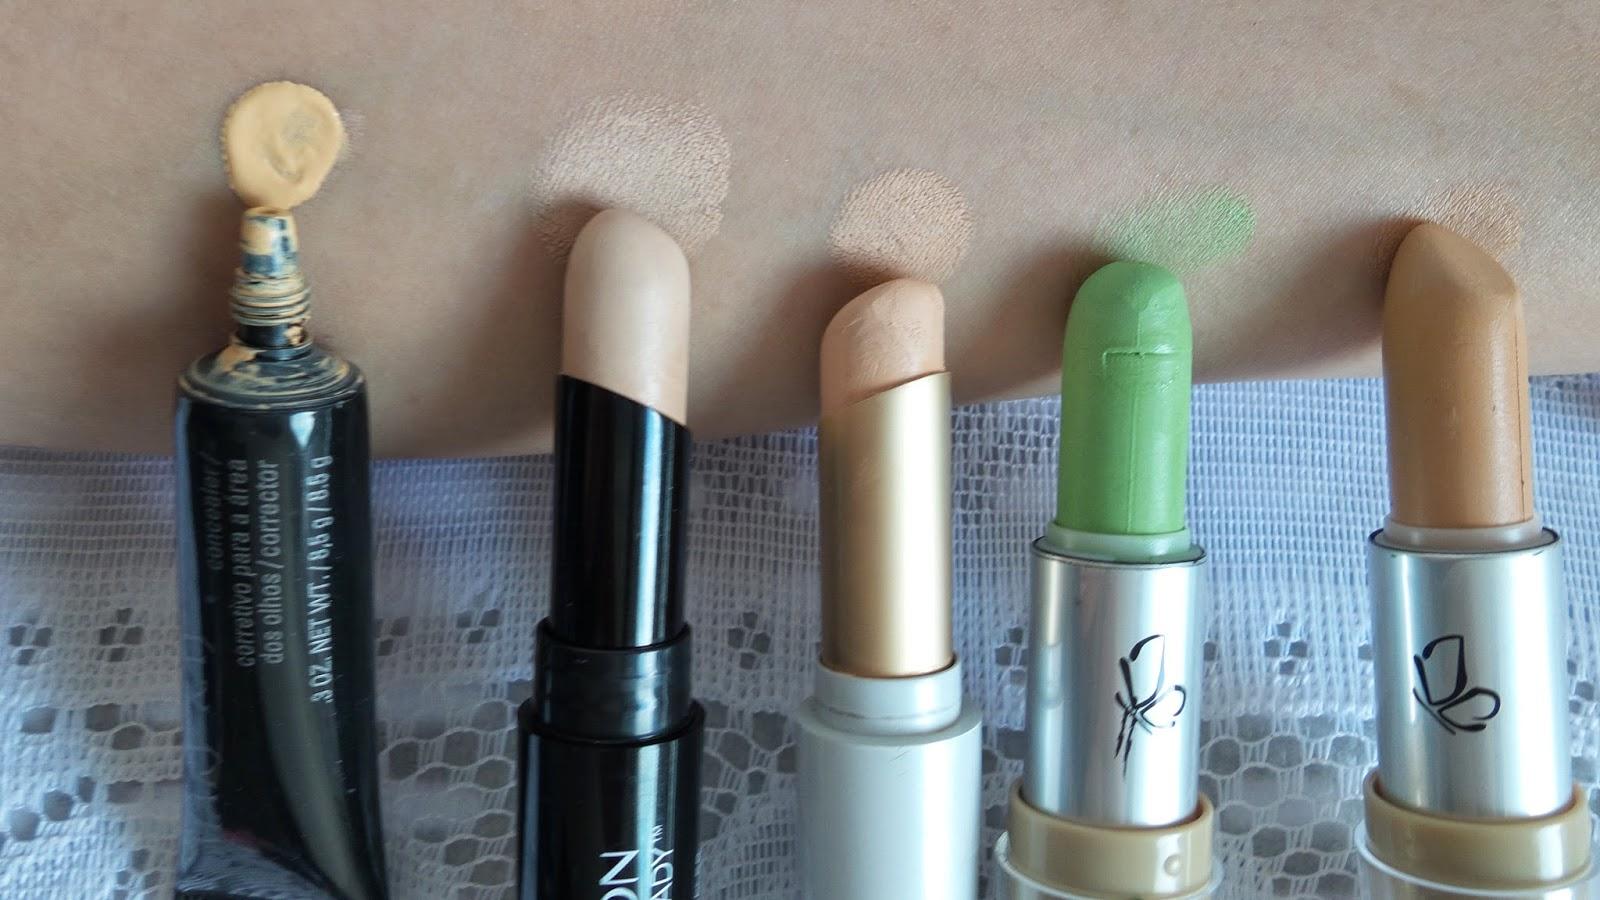 Corretivos: Mary Kay,  Revlon Photoready, Beauty Color, corretivo Vult Verde, Corretivo bege